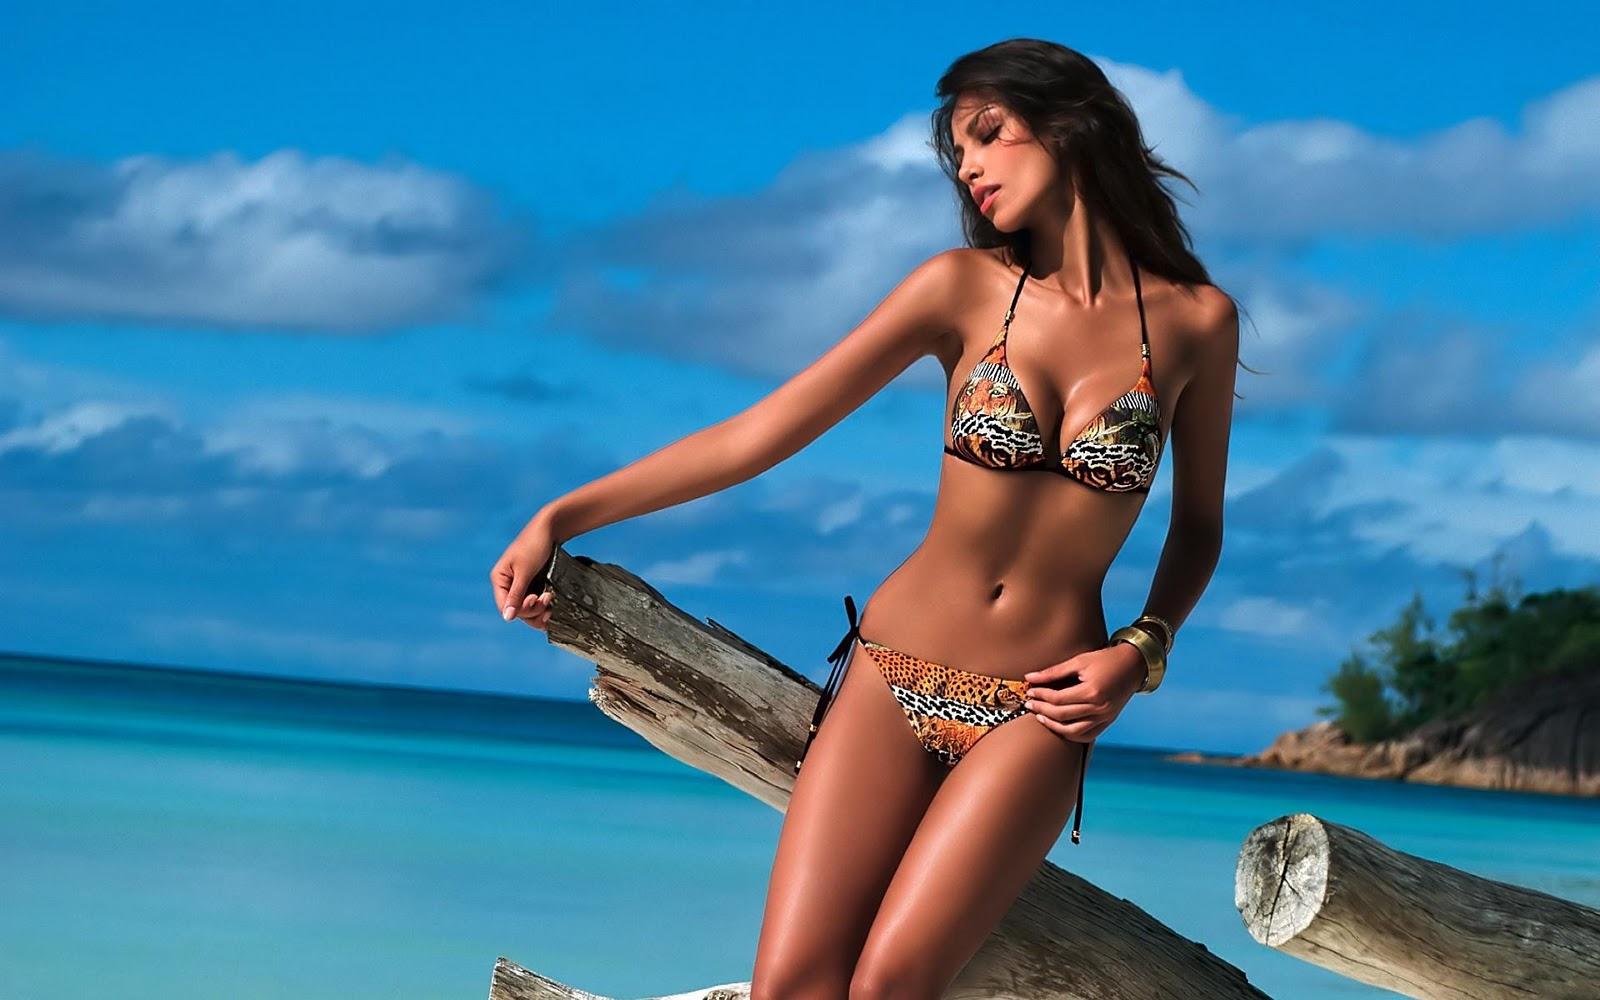 Hot Bikini Babes HD Wallpapers Hot Photos Hub